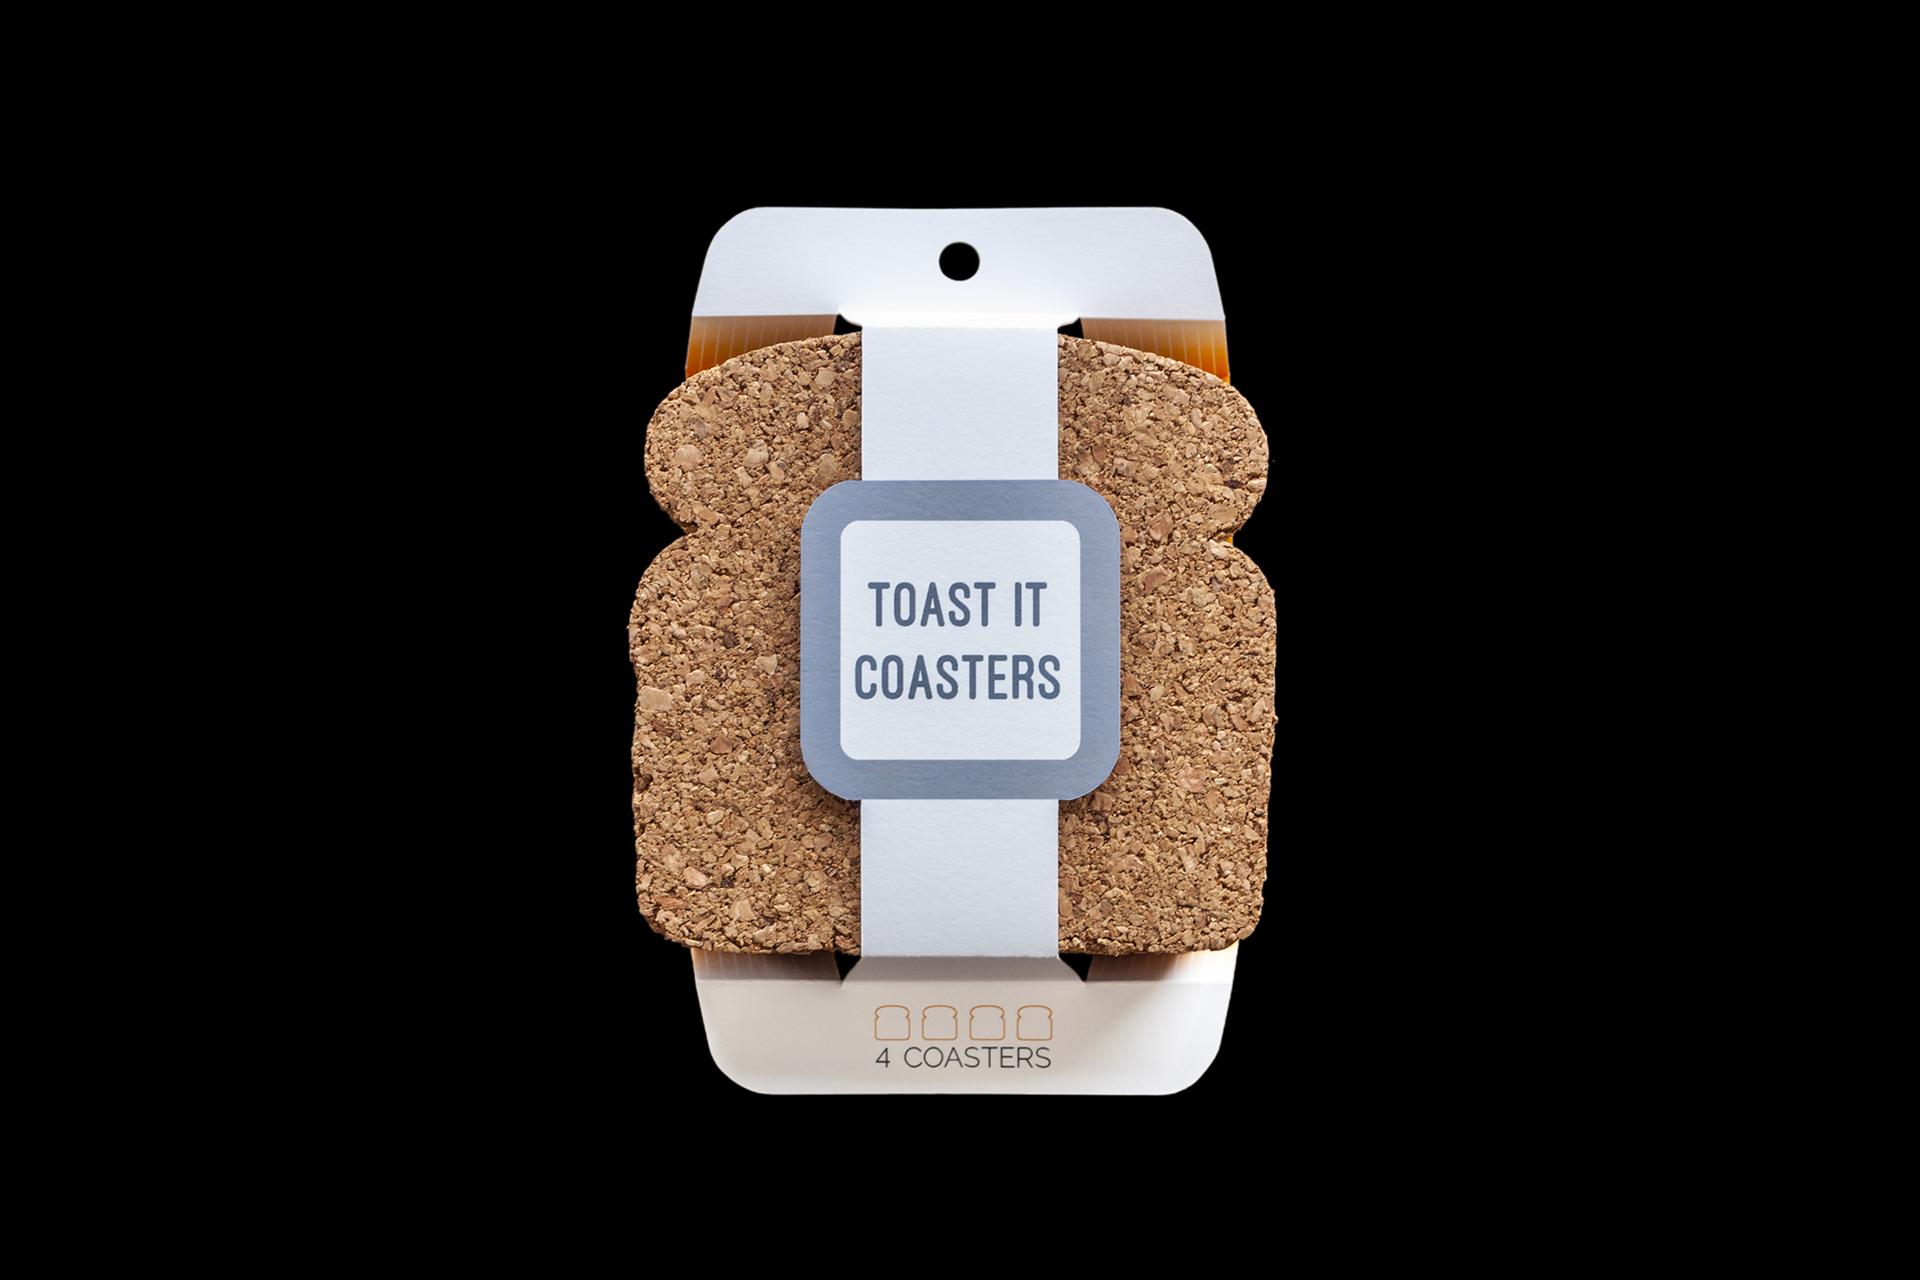 Toast It Coasters Final 1.jpg